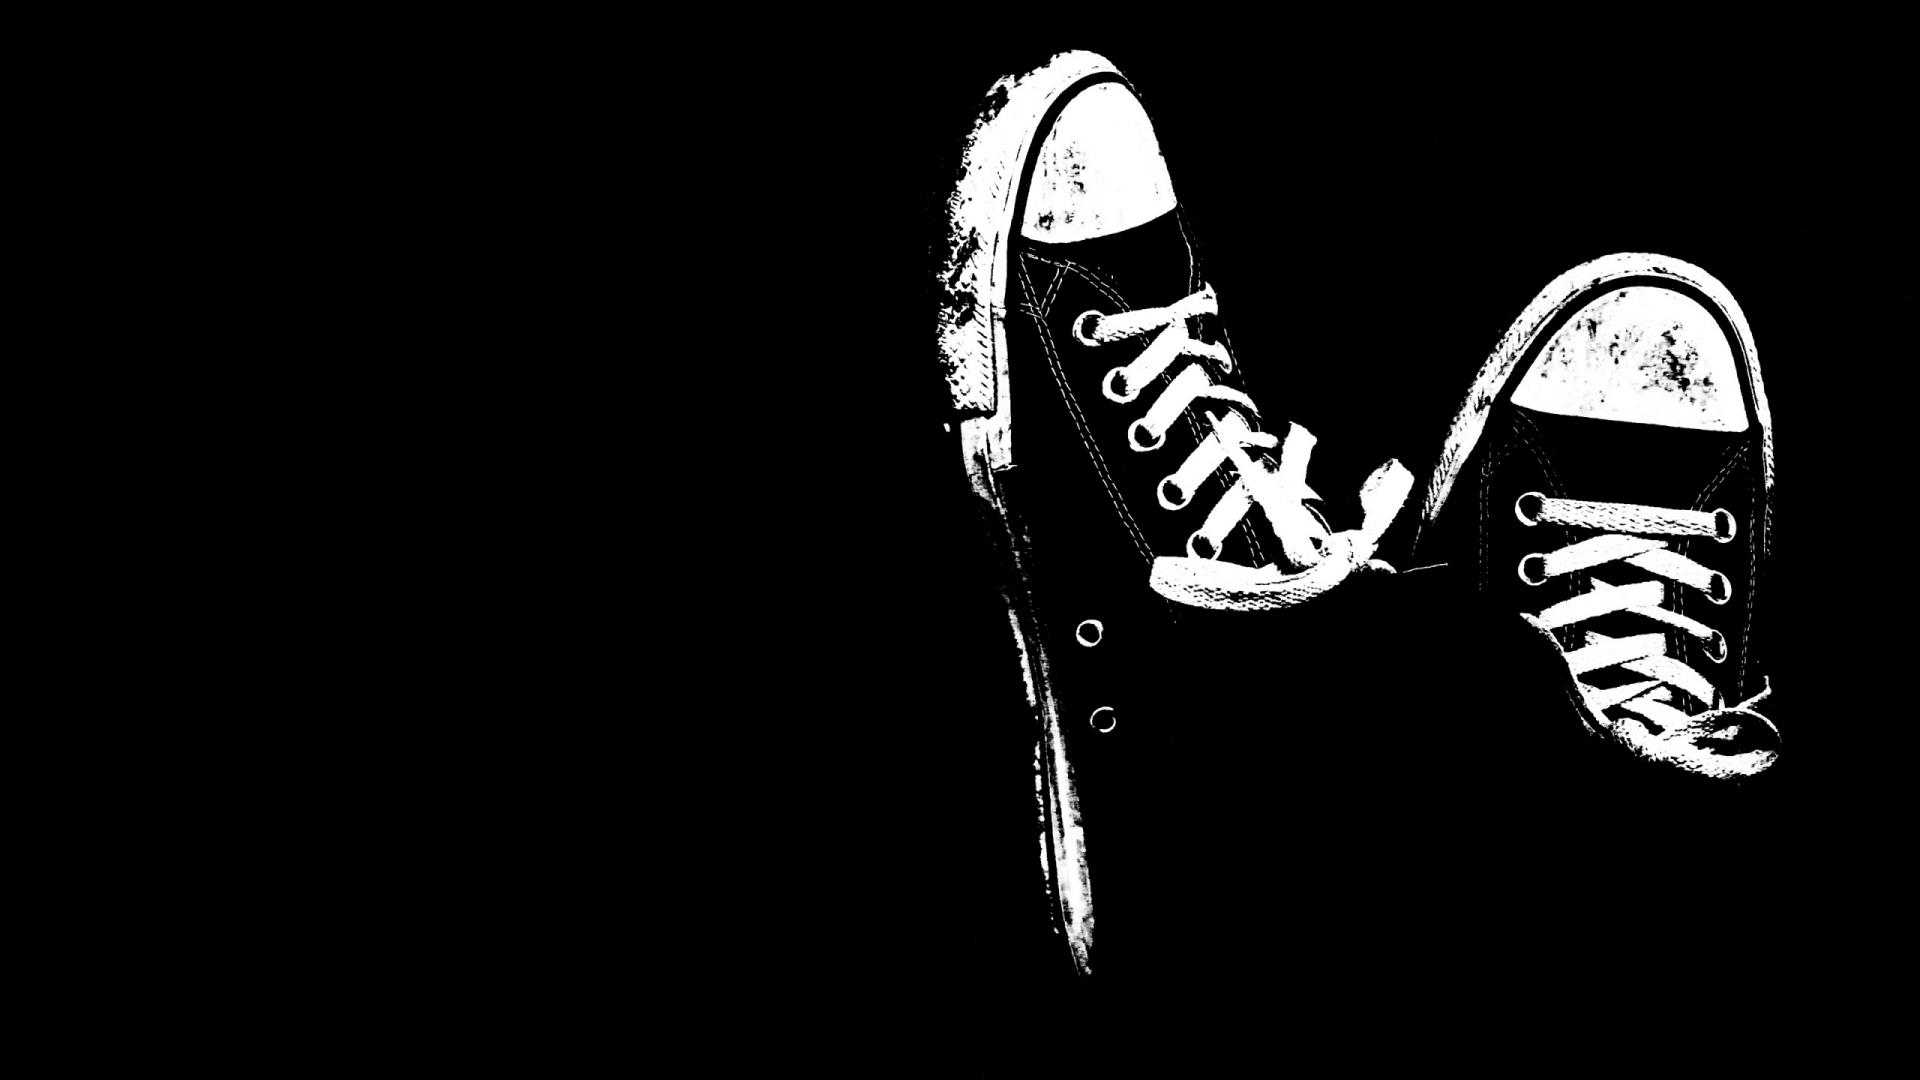 1080p Shoes Wallpaper Hd